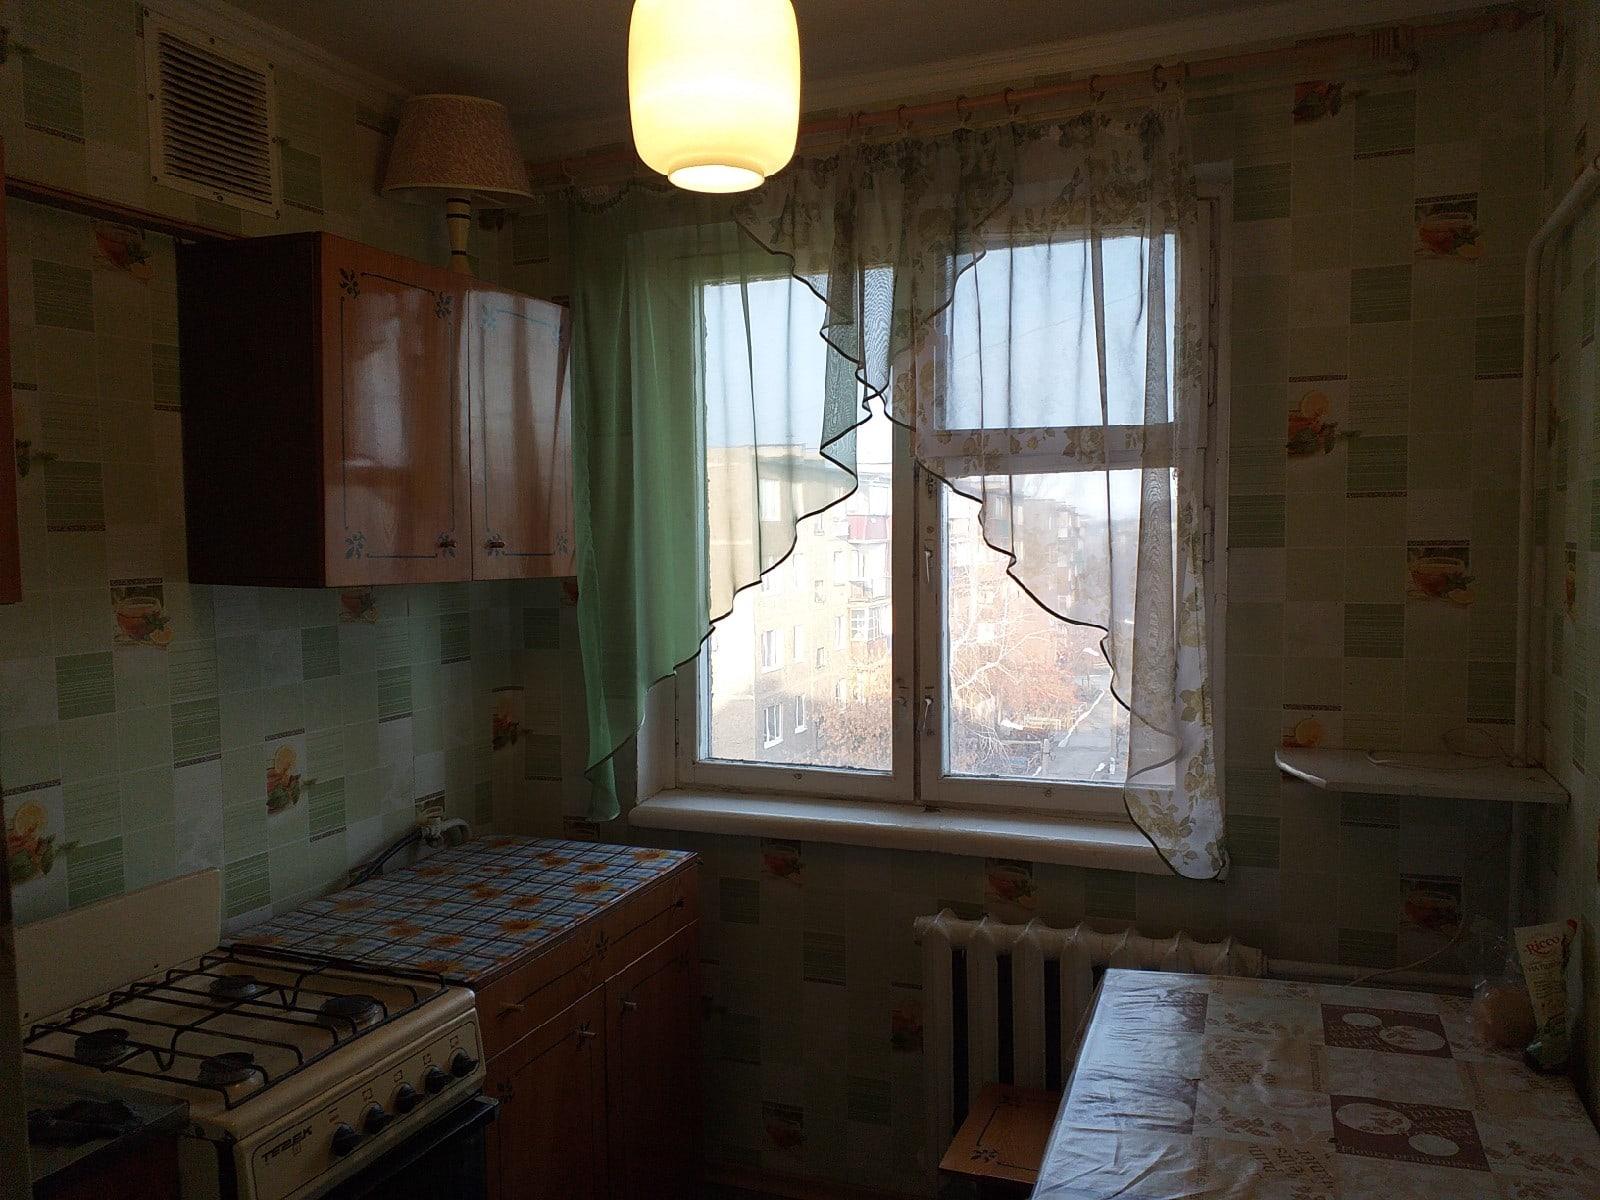 Сдам 1 комнатную квартиру ост. Луч,в | Объявления Орска и Новотроицка №281